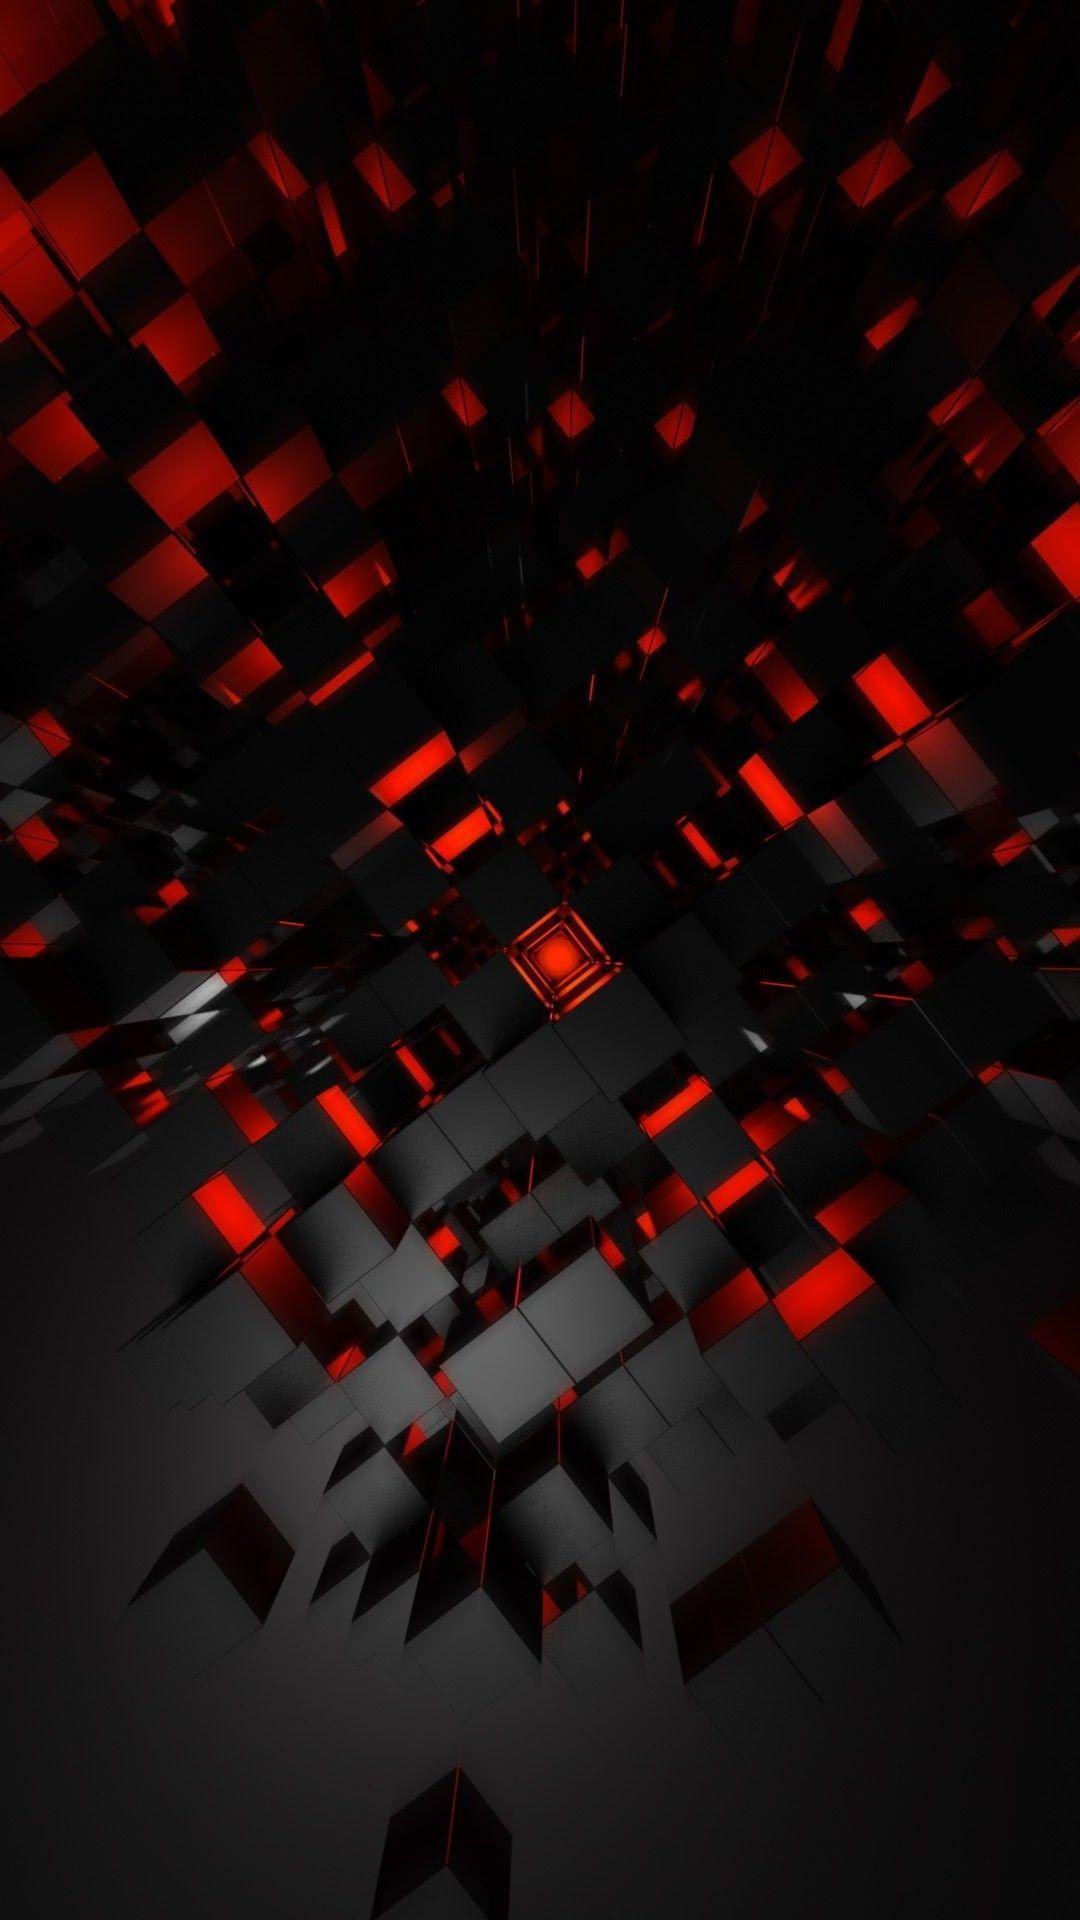 Dark Red Wallpaper Iphone : wallpaper, iphone, IPhone, Wallpapers, Backgrounds, WallpaperAccess